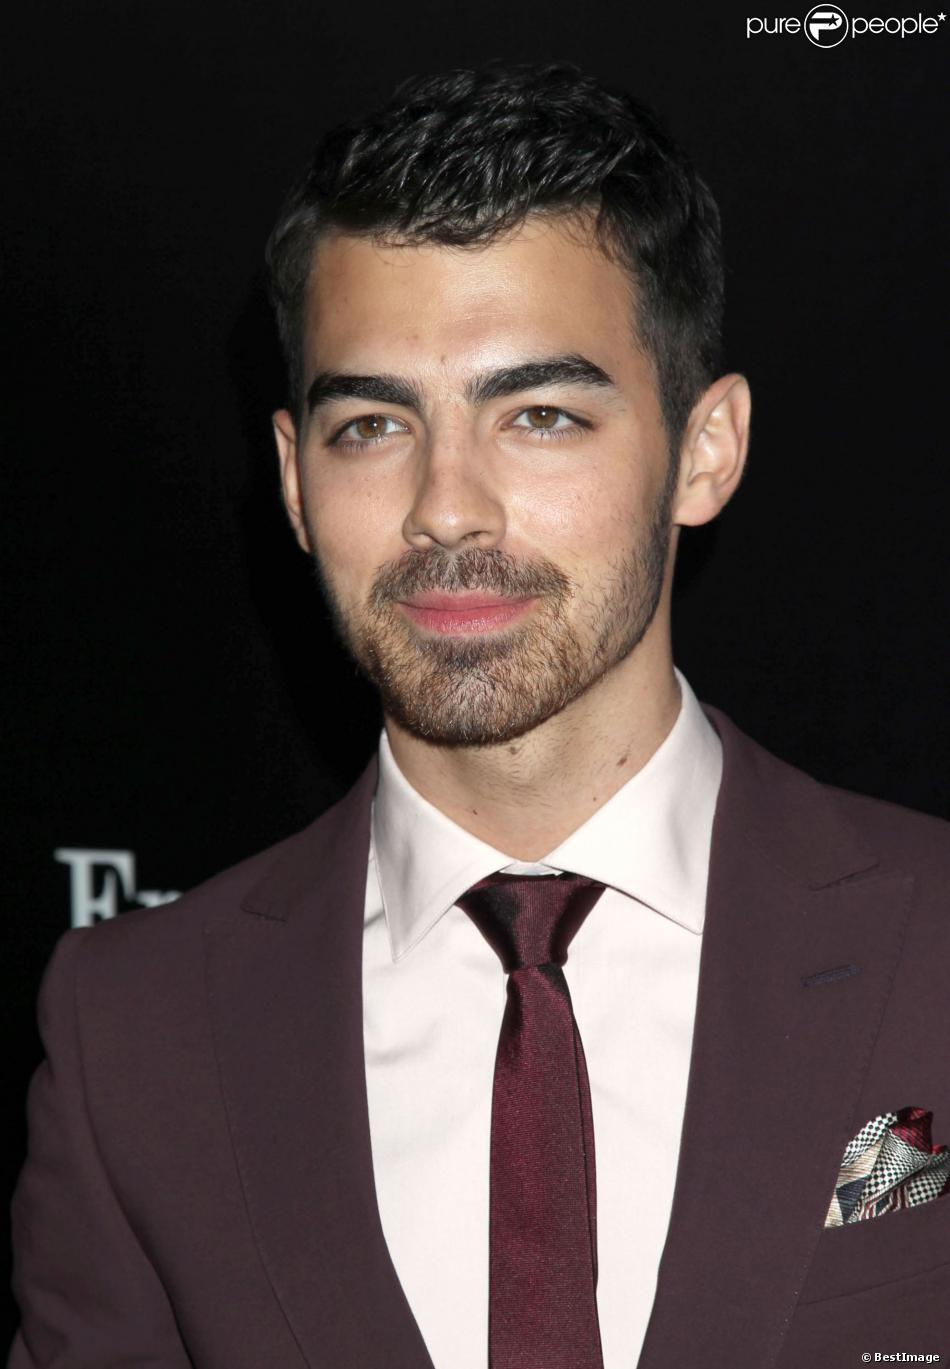 Joe Jonas lors de l'ouverture du Ermenegildo Zegna Global Store à Beverly Hills, le 7 Novembre 2013.